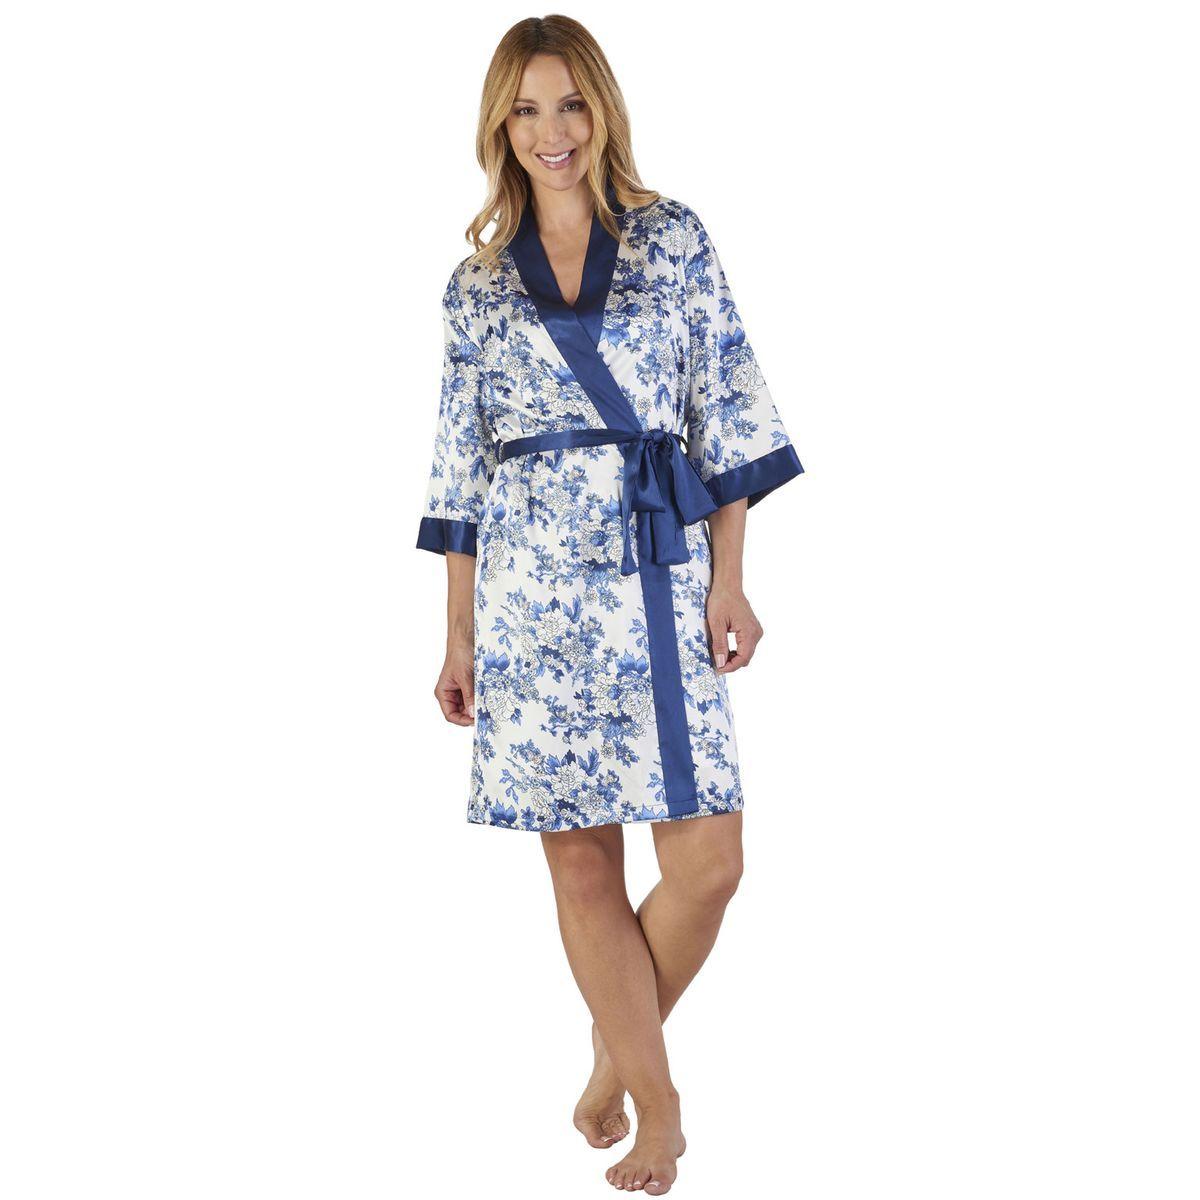 Robe De Chambre Imprime Floral Robe Robe De Chambre Et Robe Kimono